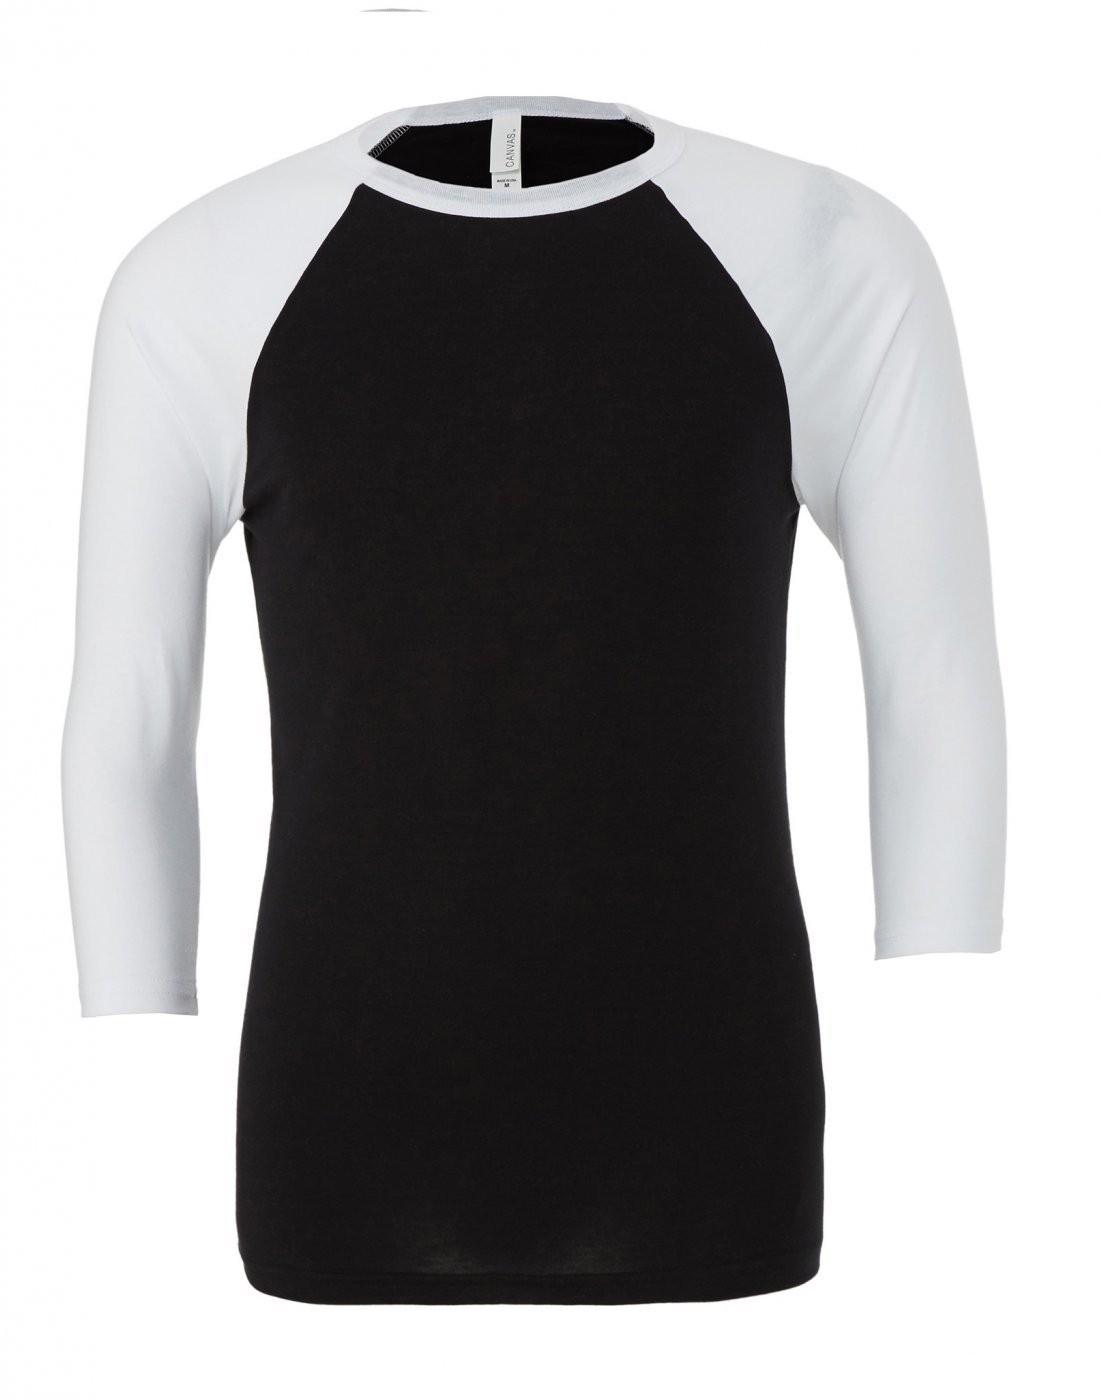 05c4ded0af7 Tri-blend 3 4 Sleeve Baseball T-shirt by Bella   Canvas (BE100)